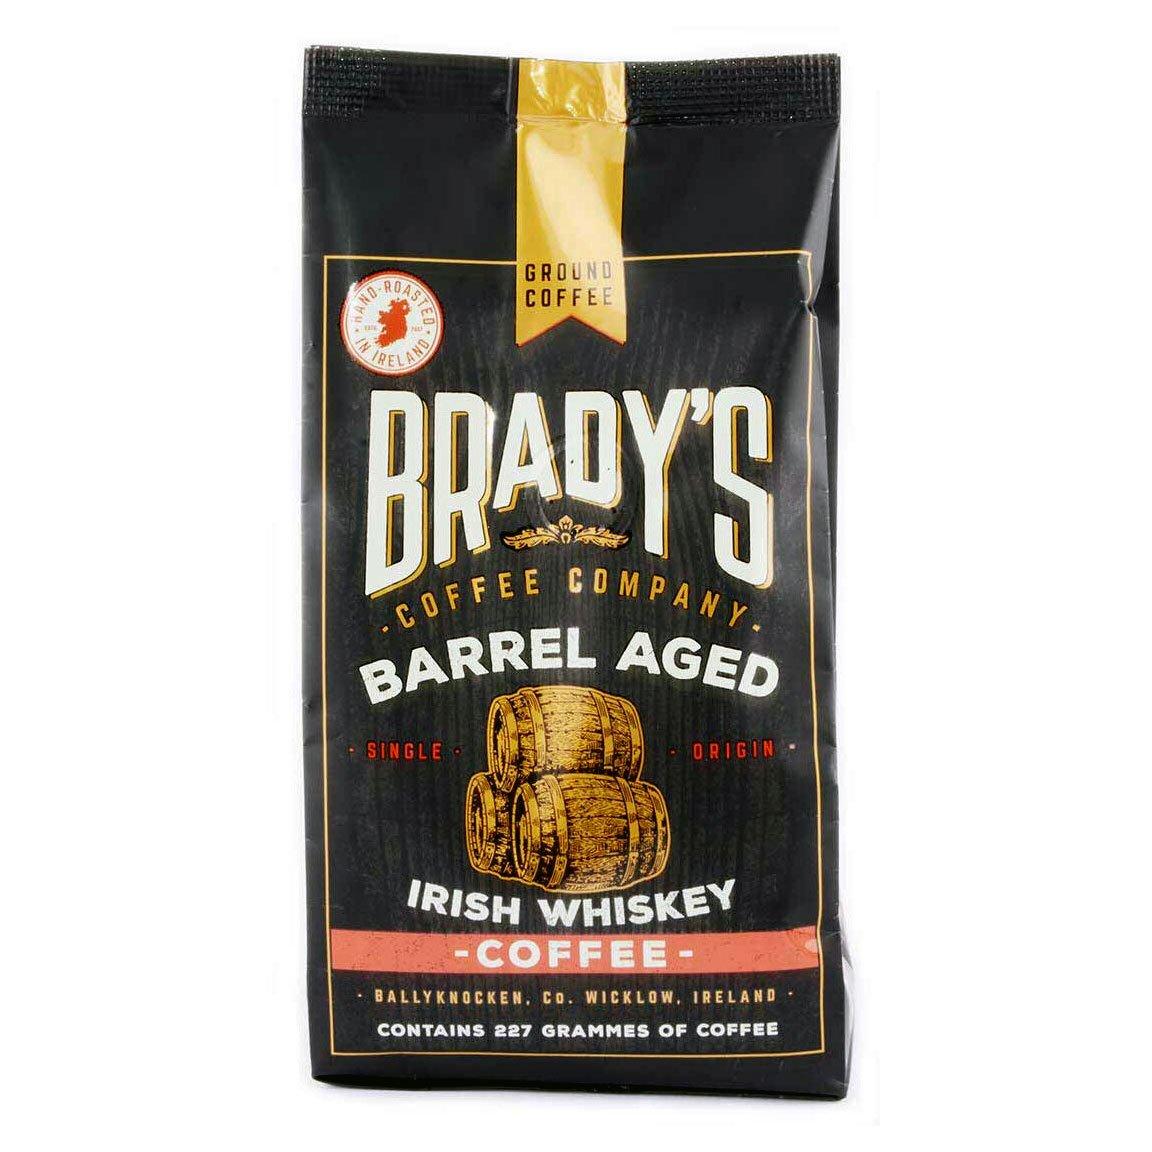 Brady's Barrel Aged Irish Whiskey Coffee